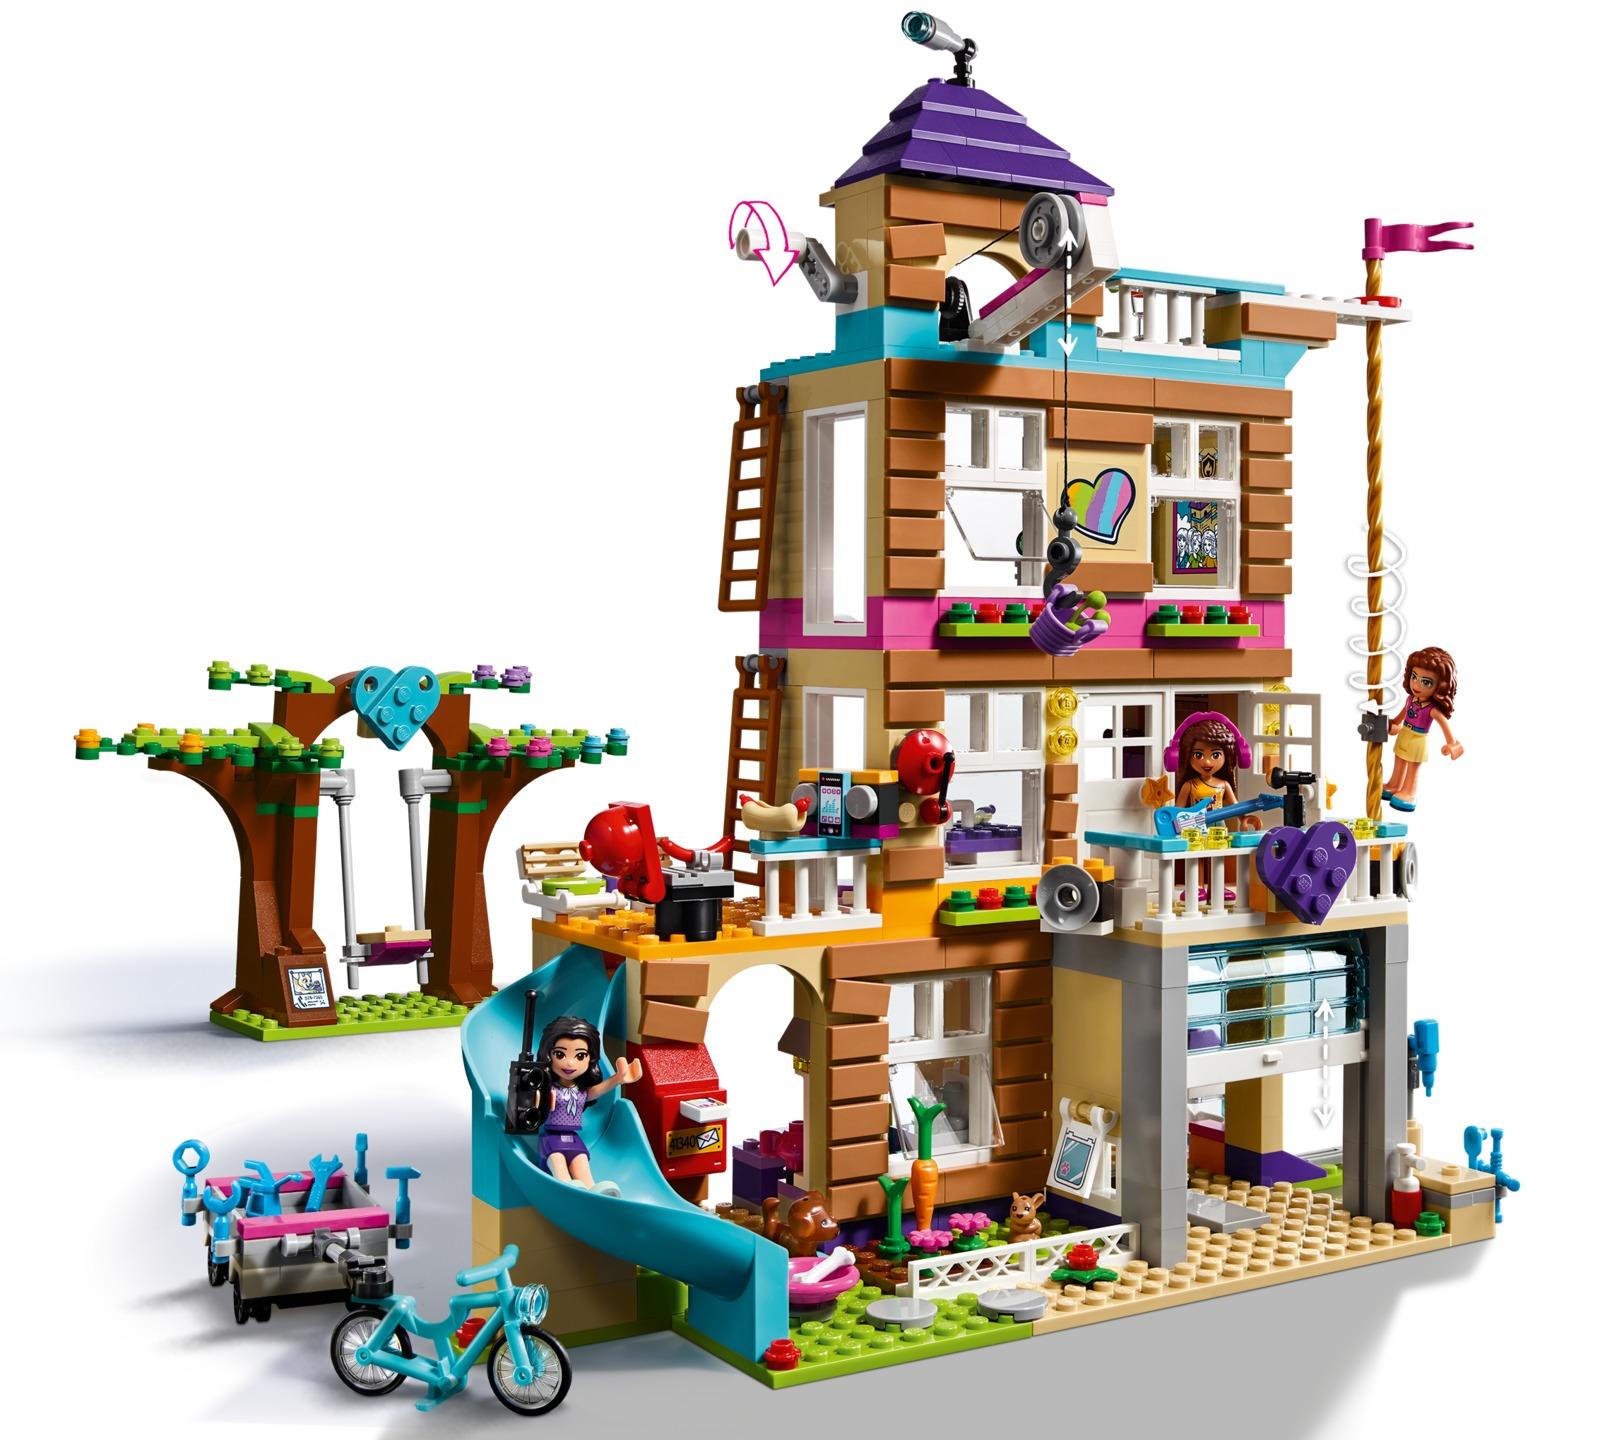 LEGO Friends: Friendship House (41340) image